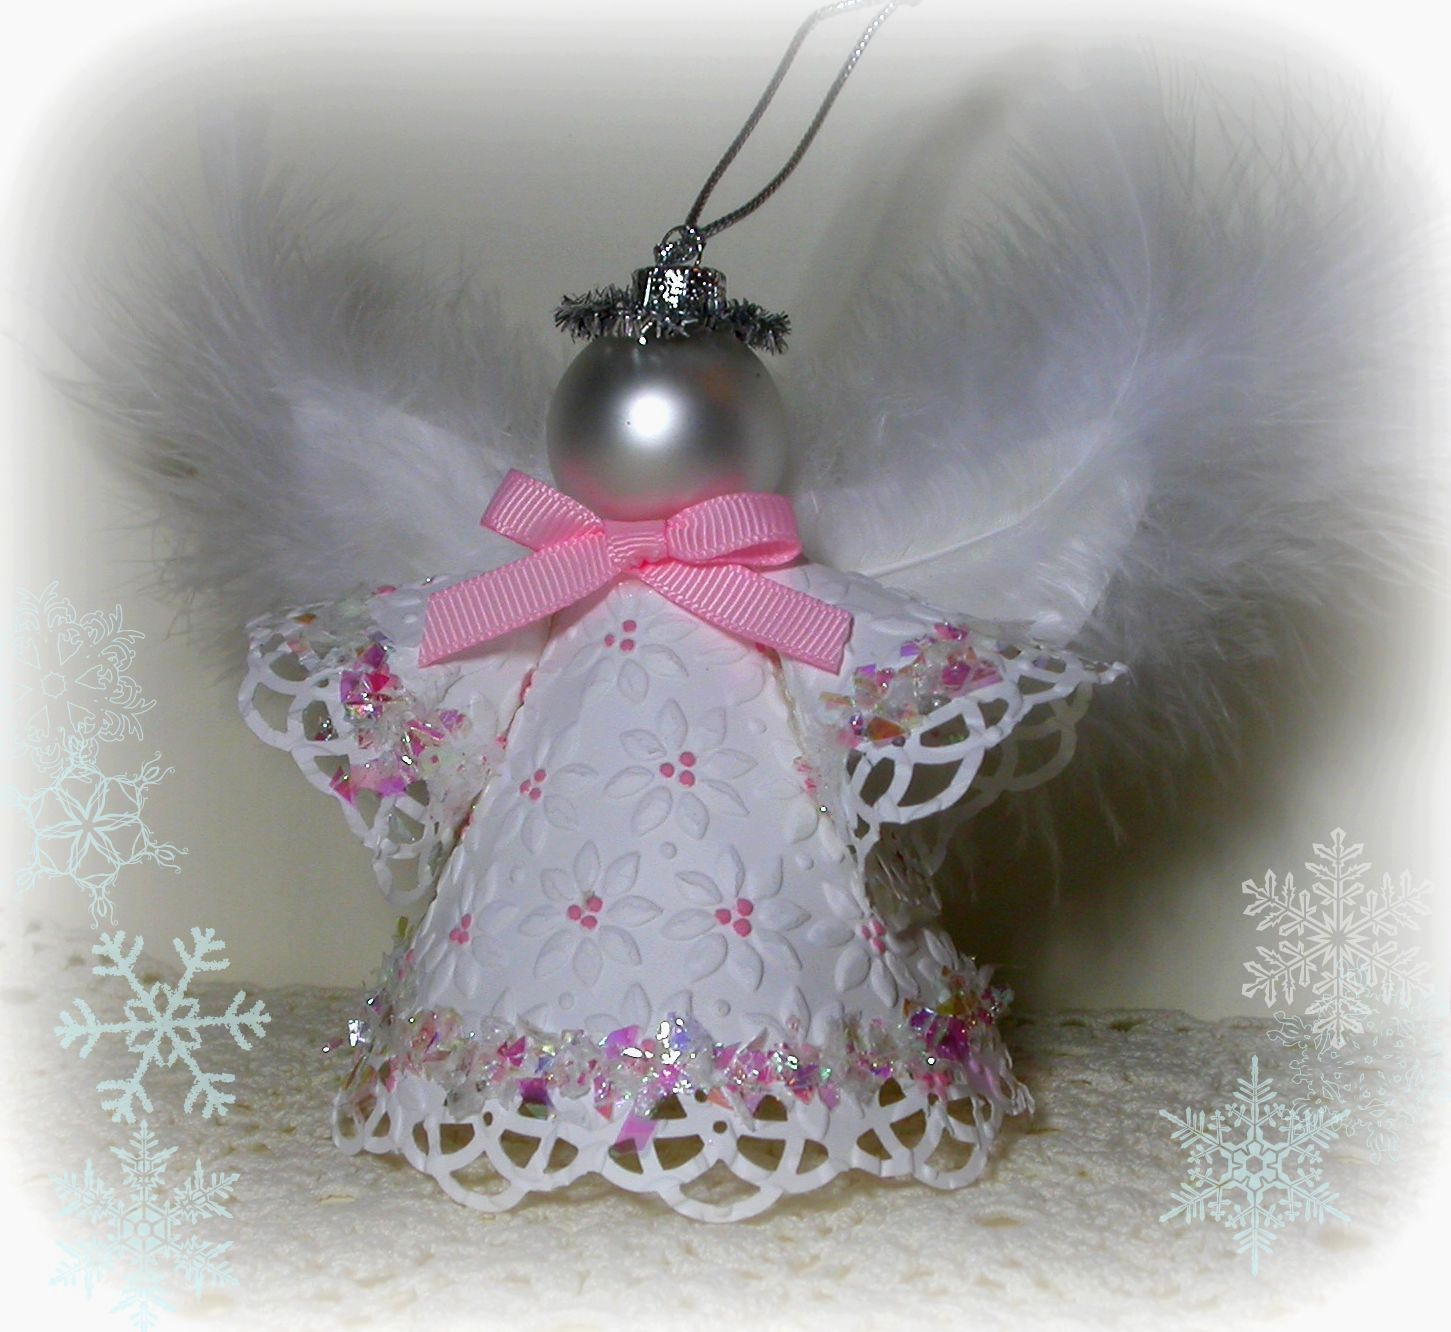 Cute Angel Ornaments to Make | Paper Angel Ornament | DIY Craft ...